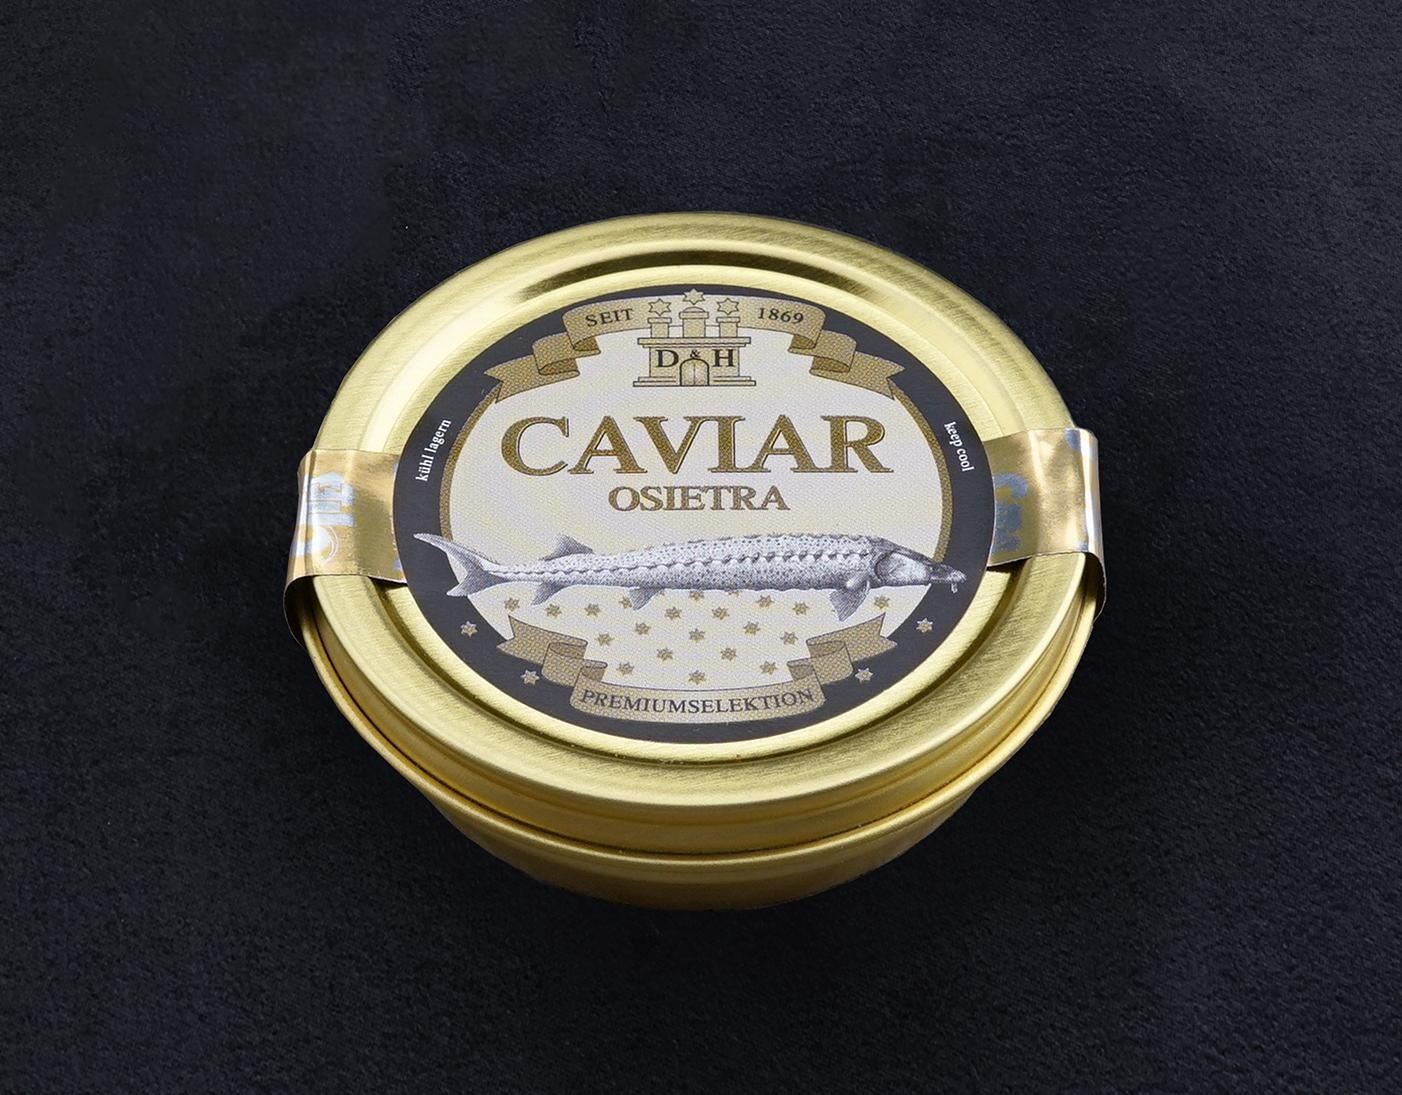 Caviar · Osietra (50g) jetzt kaufen!